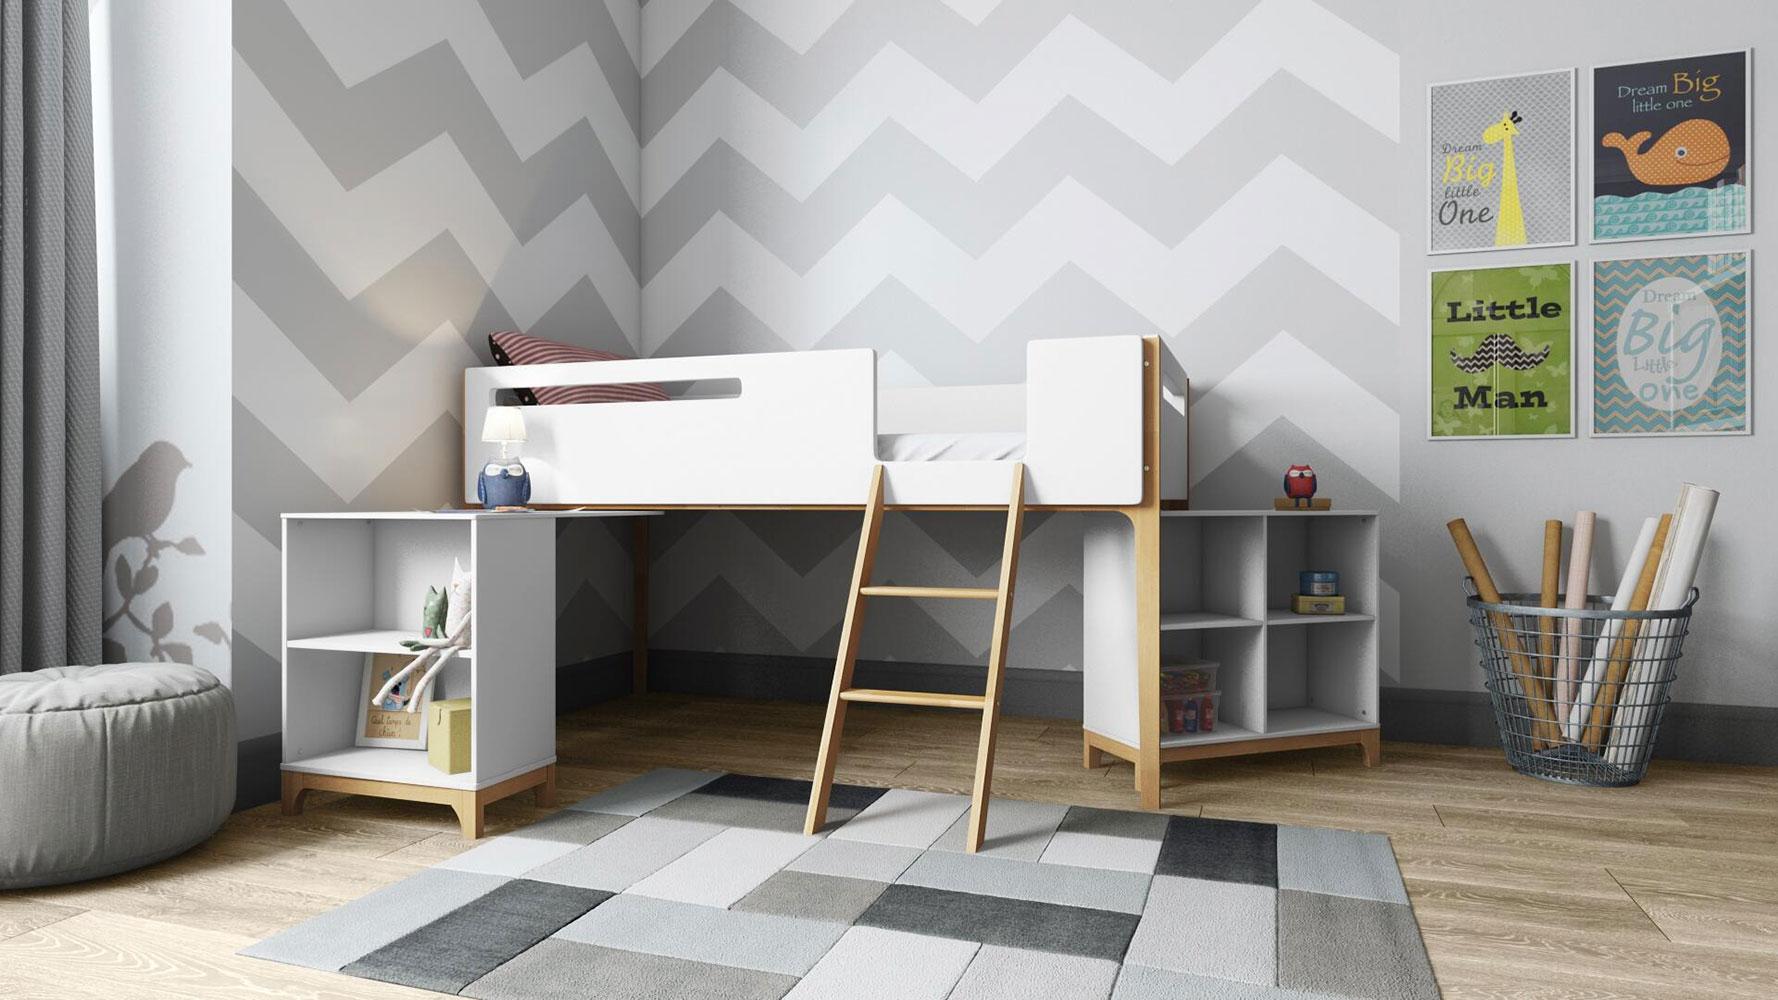 Solar Children's Bedroom Furniture Collection